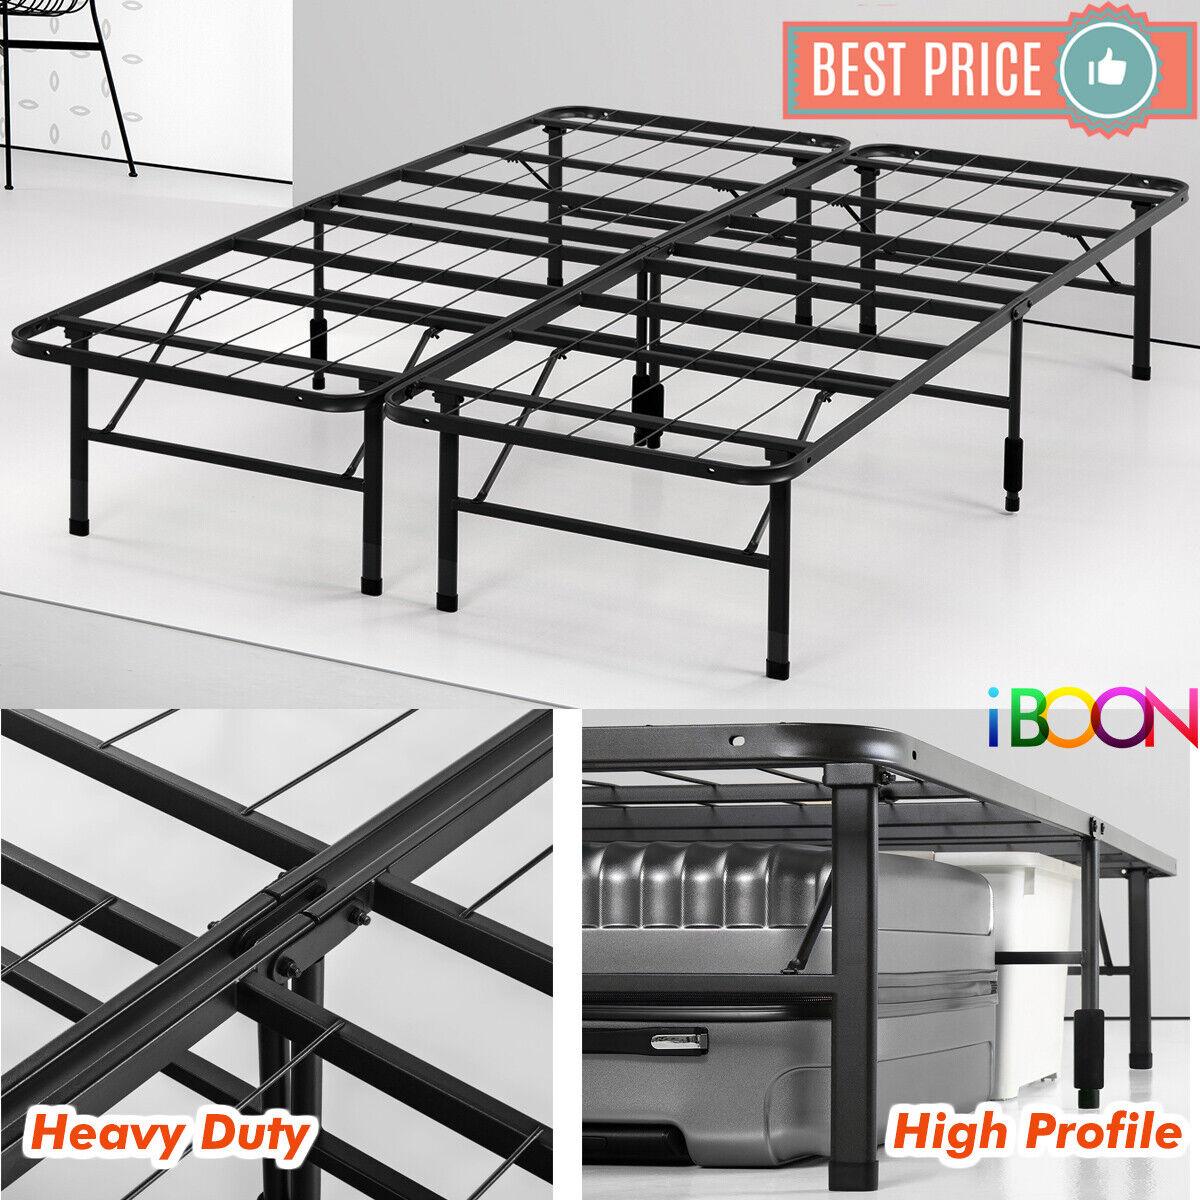 Steel Platform BED FRAME Queen Size Metal Foldable High Prof